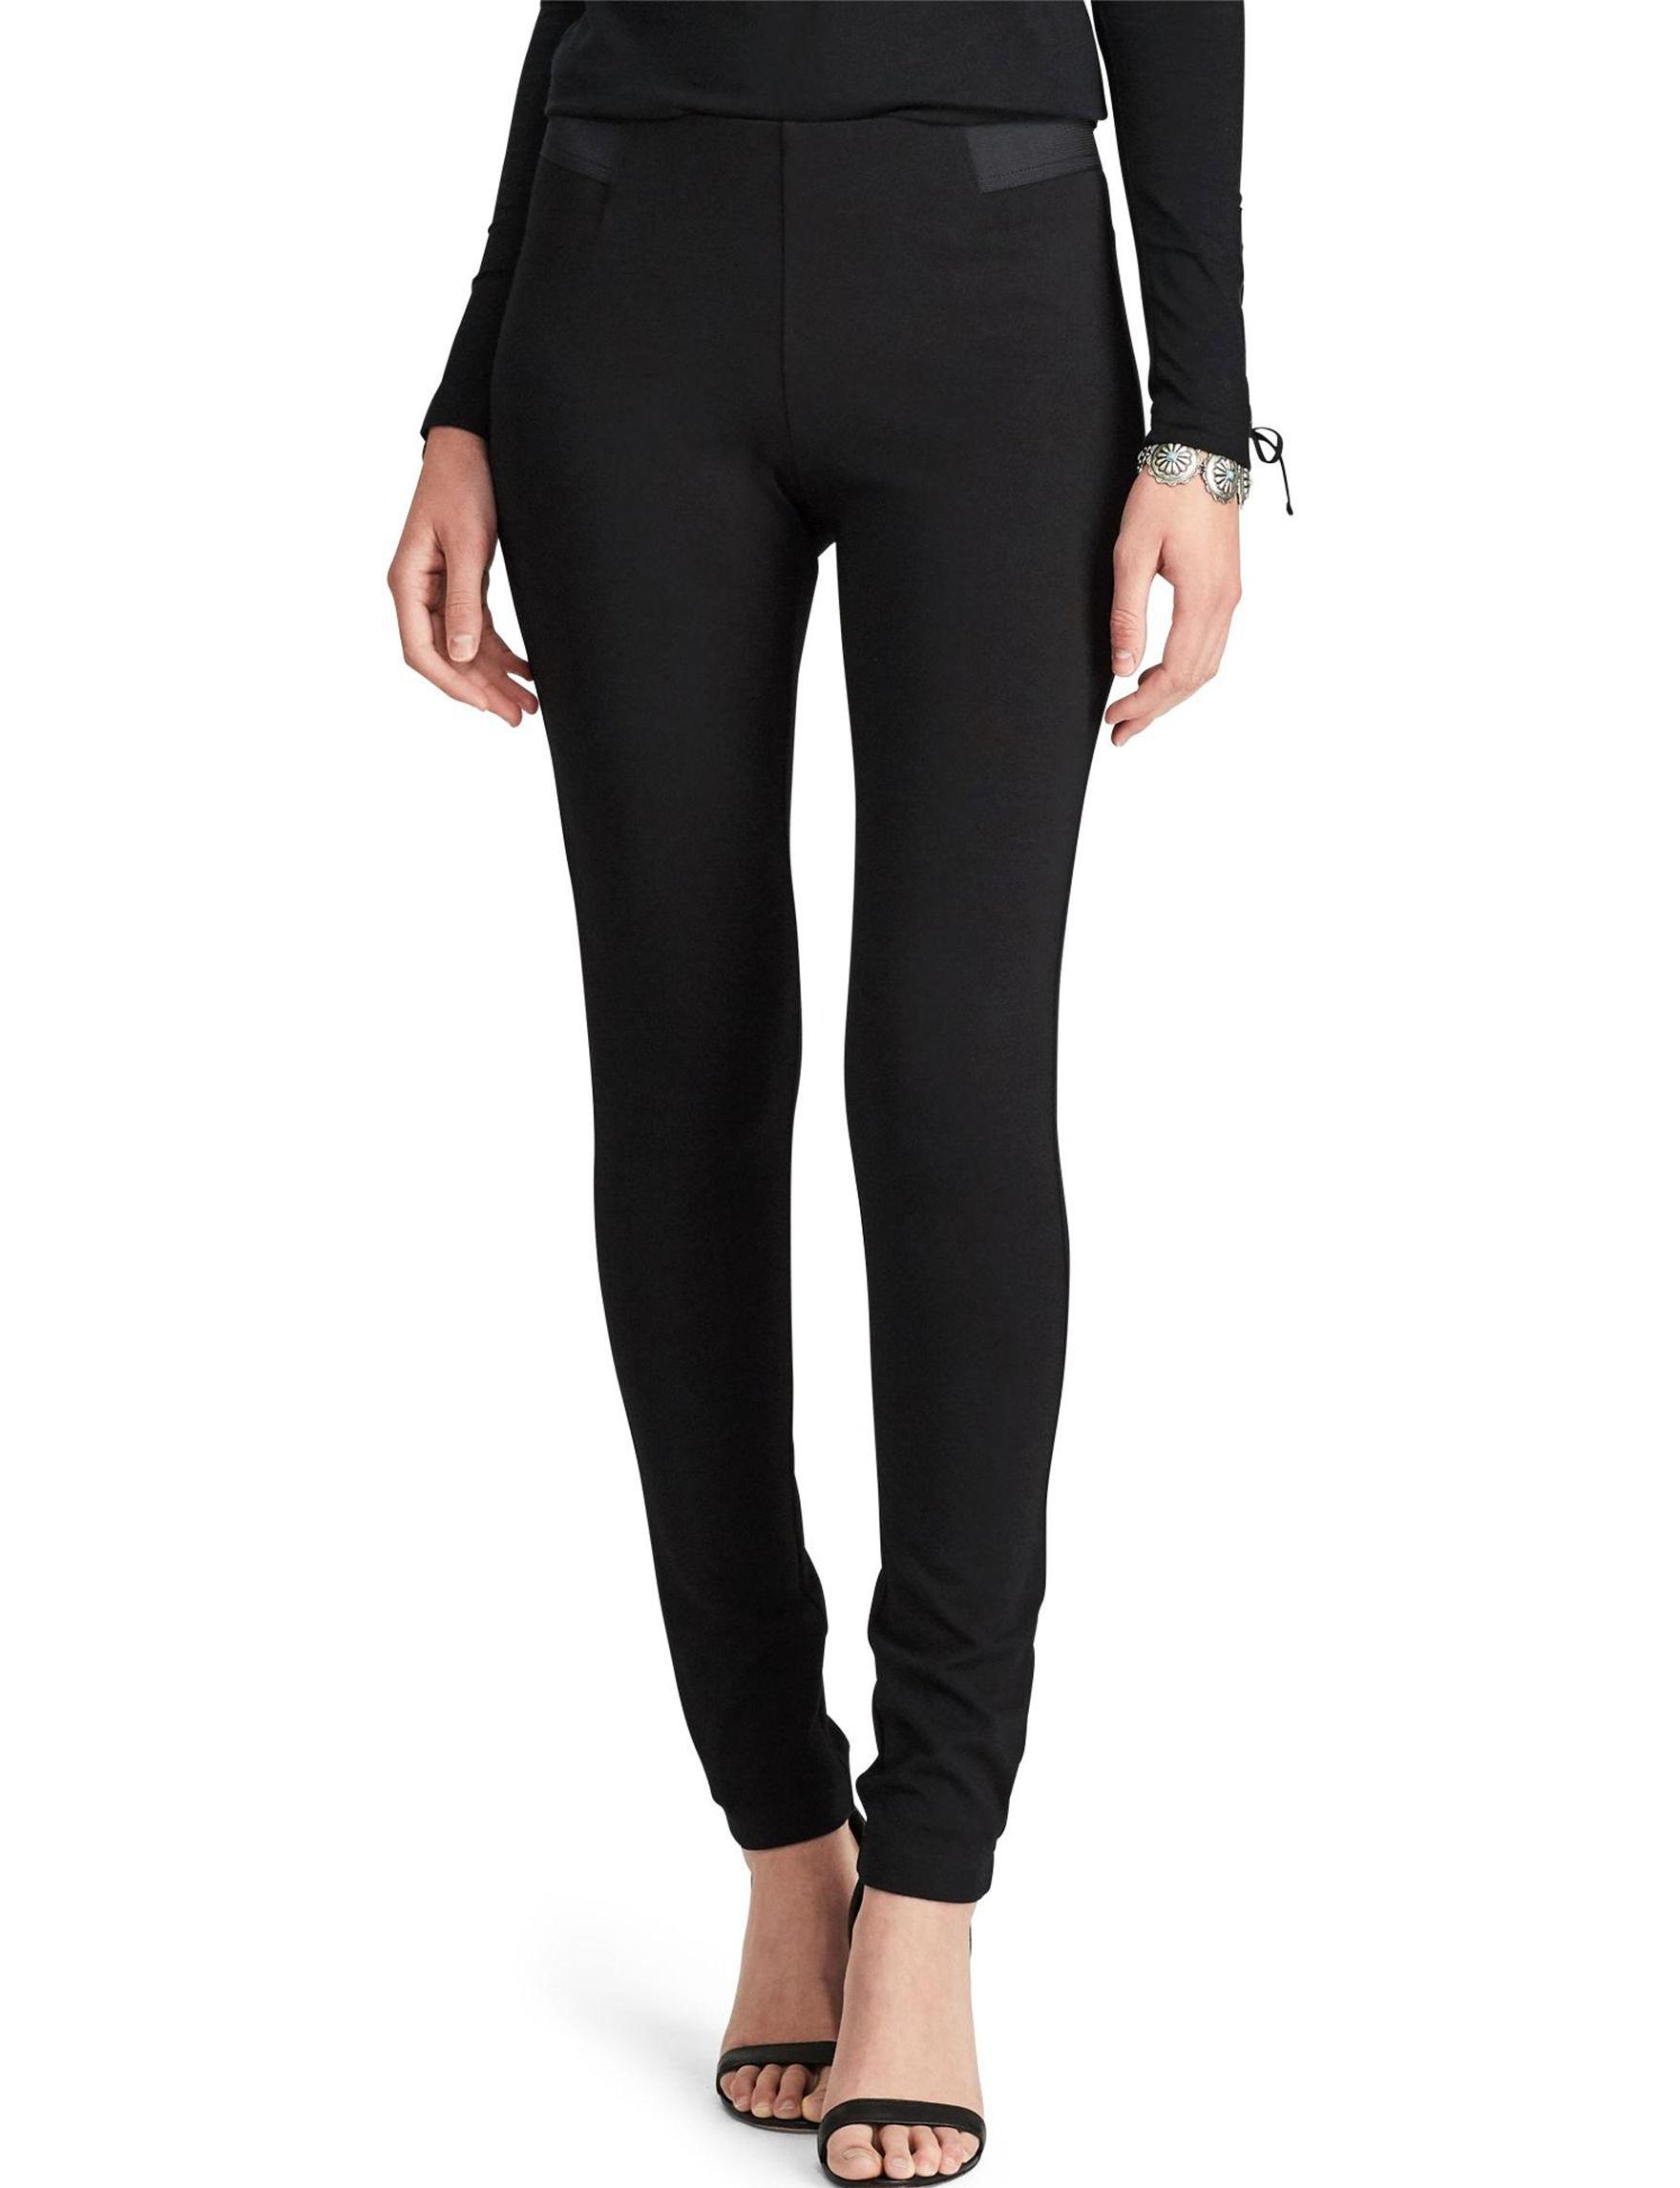 Chaps Black Soft Pants